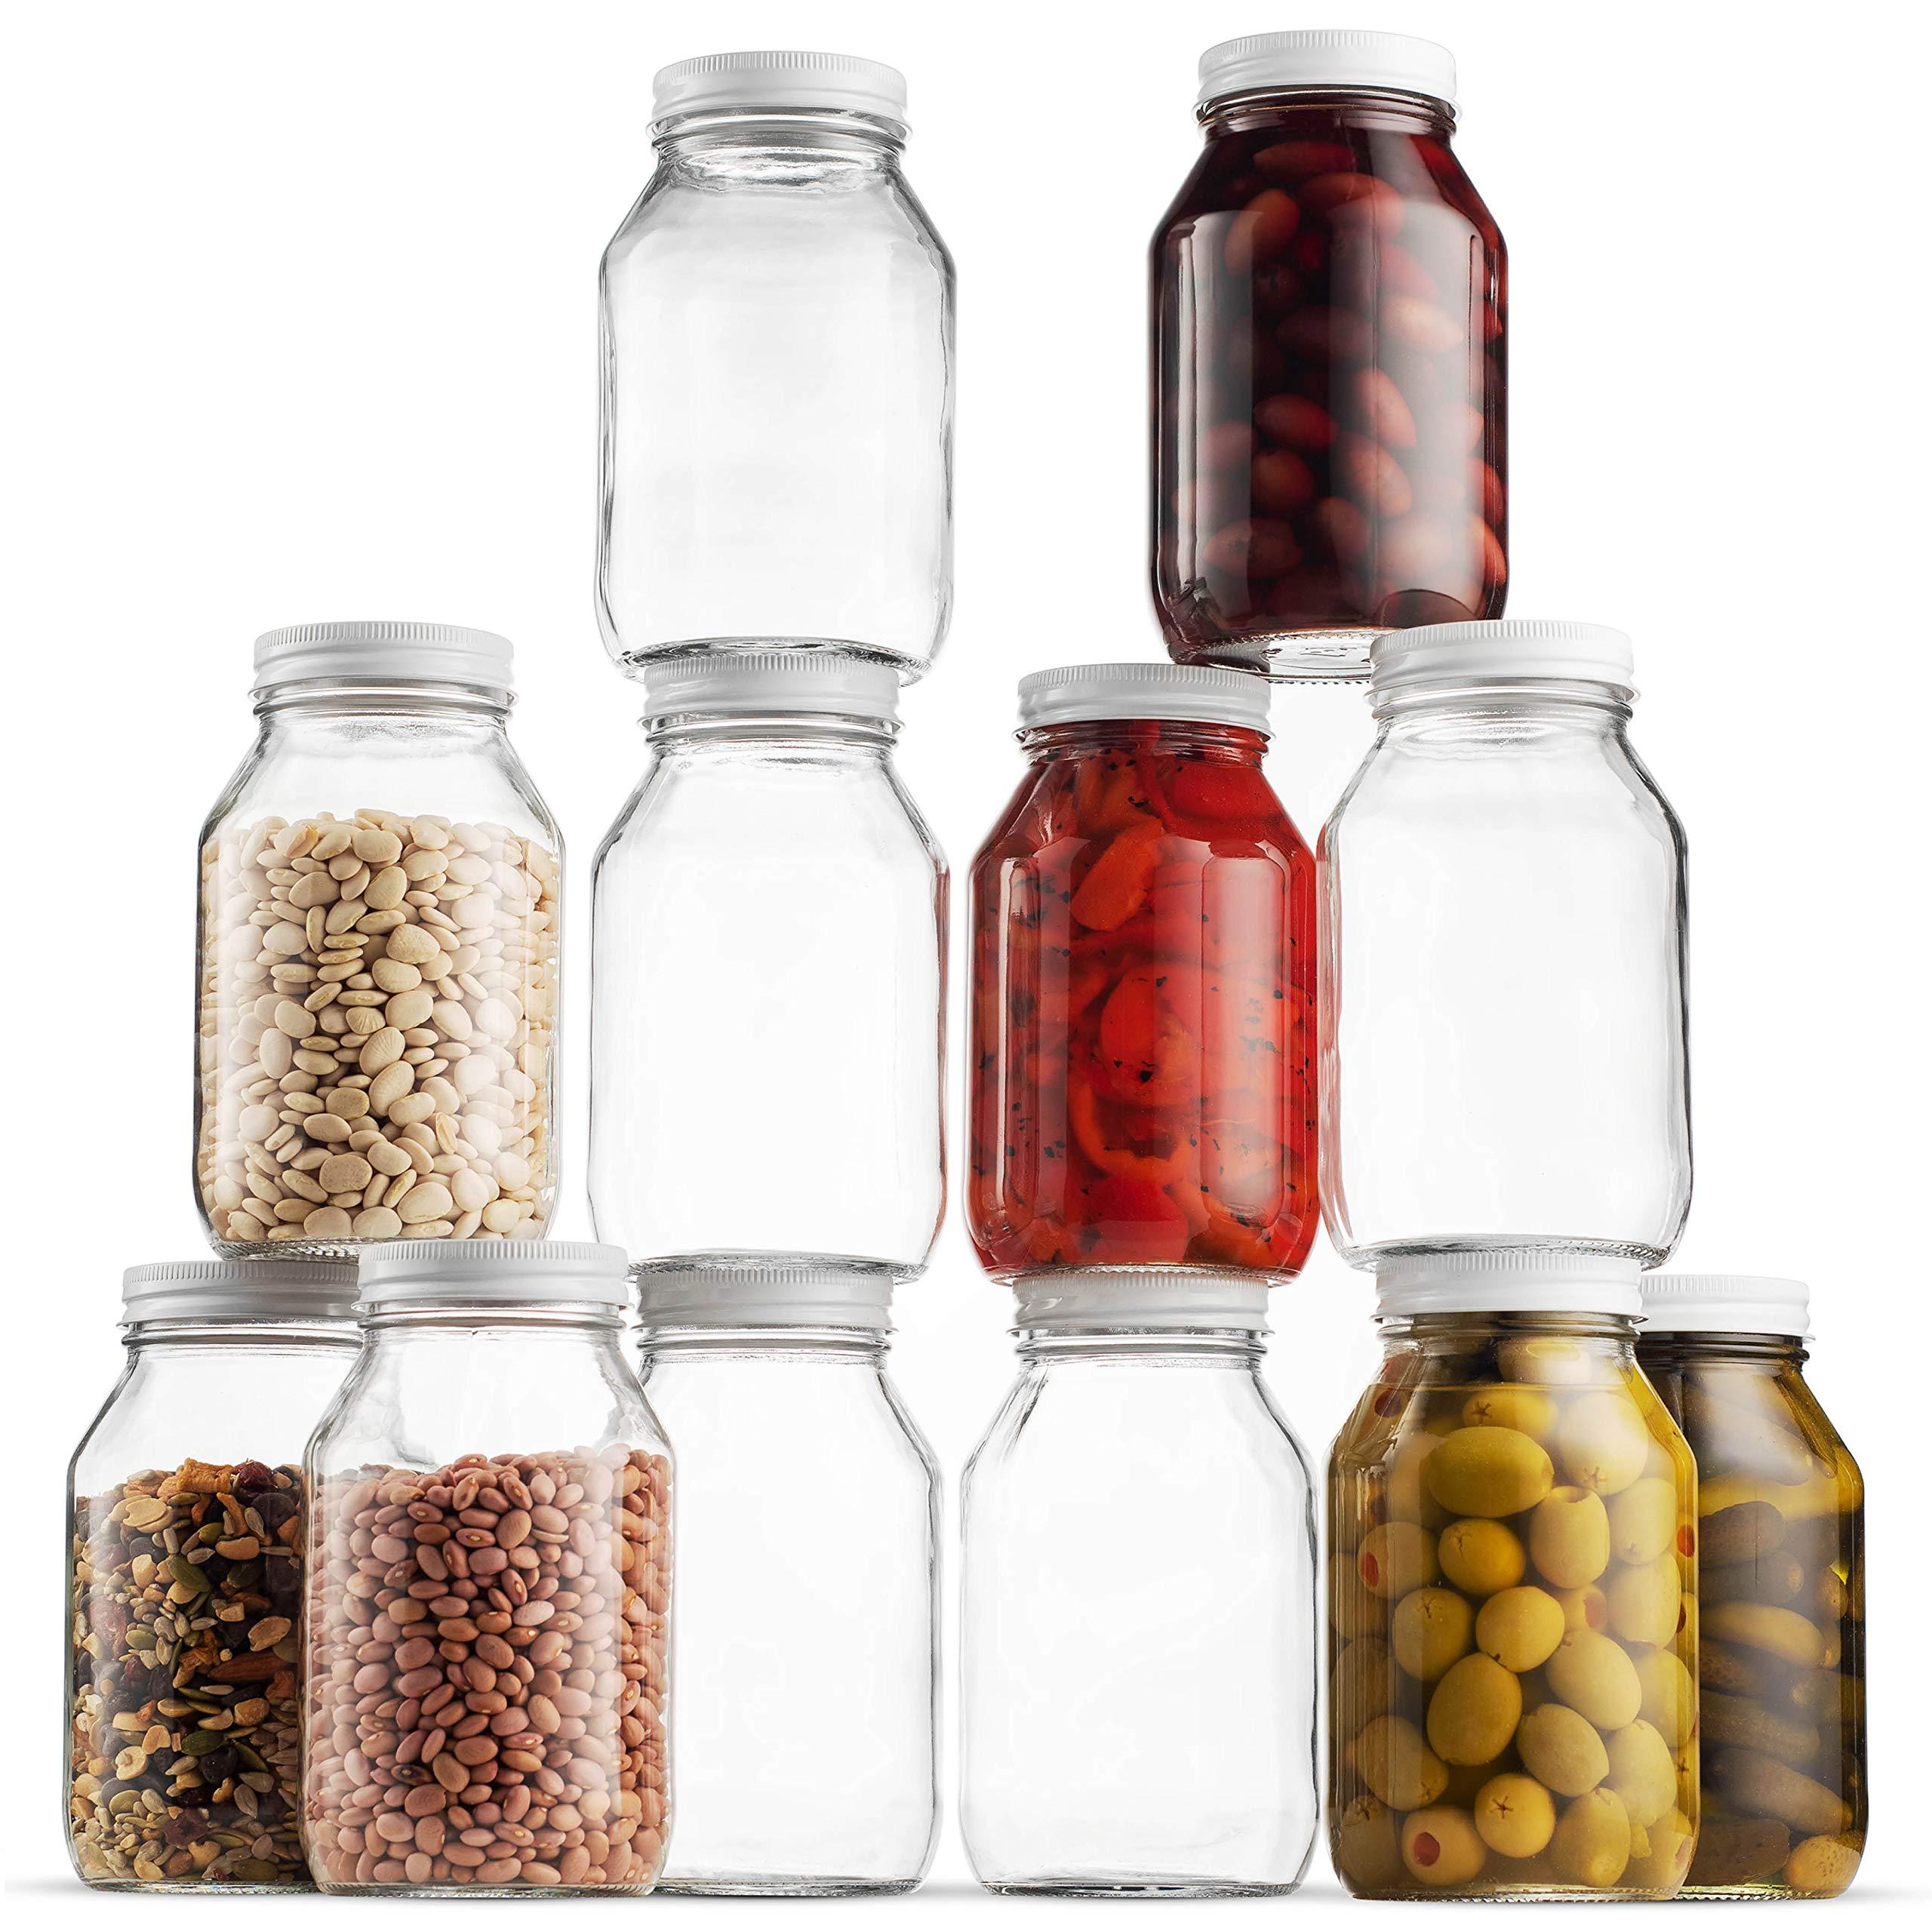 Glass Mason Jars 32 Ounce 1 Quart Regular Mouth, Metal Airtight Lid, USDA Approved Dishwasher Safe USA Made Pickling, Preserving, Canning Jar, Dry Food Storage, Craft Storage, Decorating Jar (12 Pack) by Paksh Novelty (Image #1)